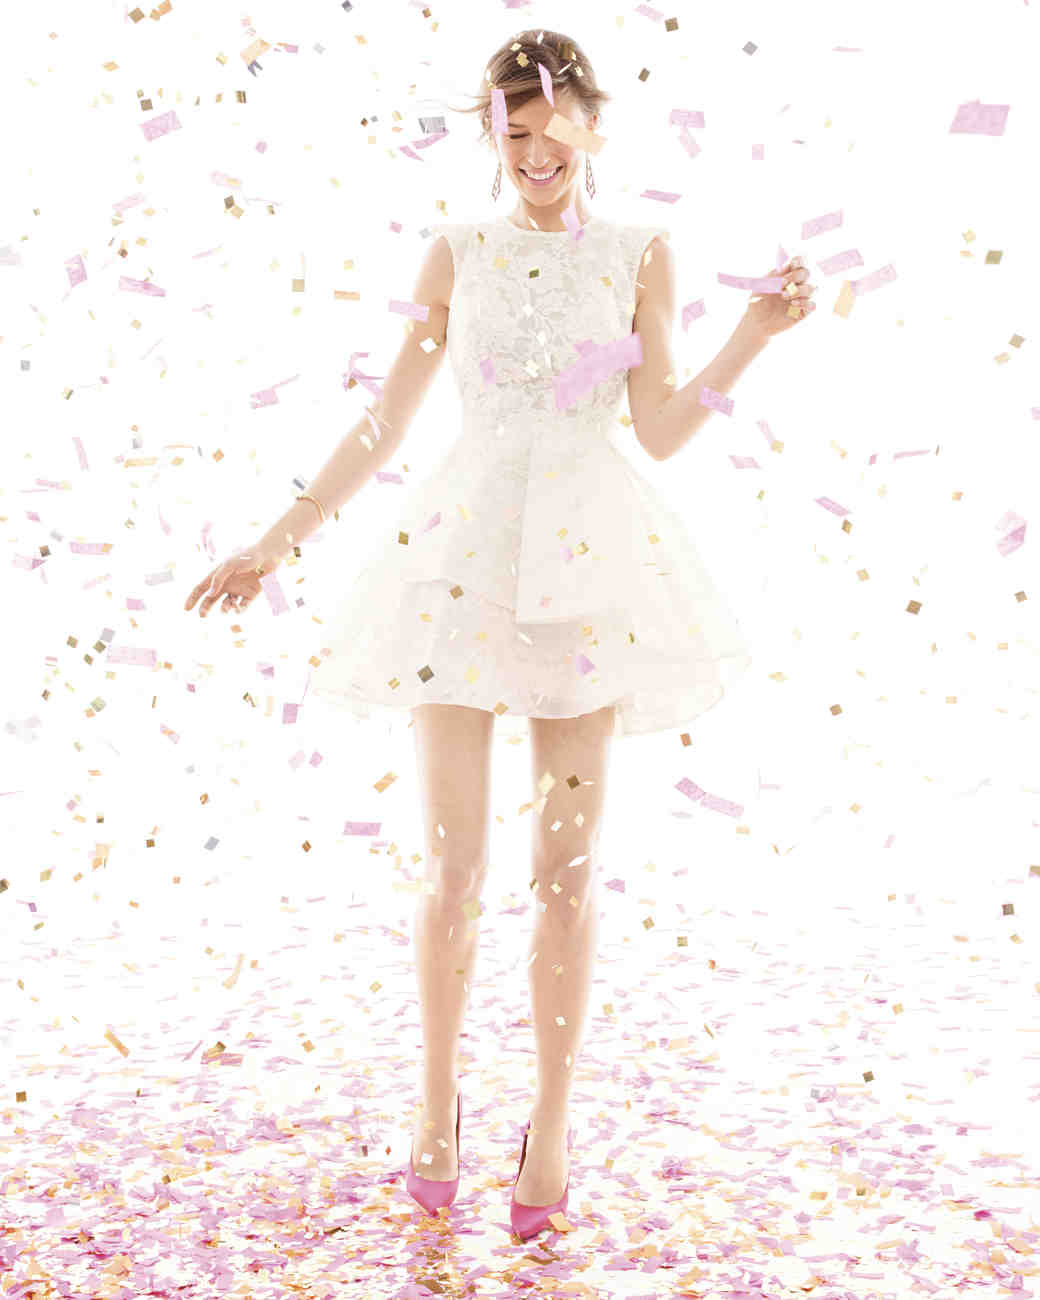 confetti-wedding-dress-215-d111904.jpg